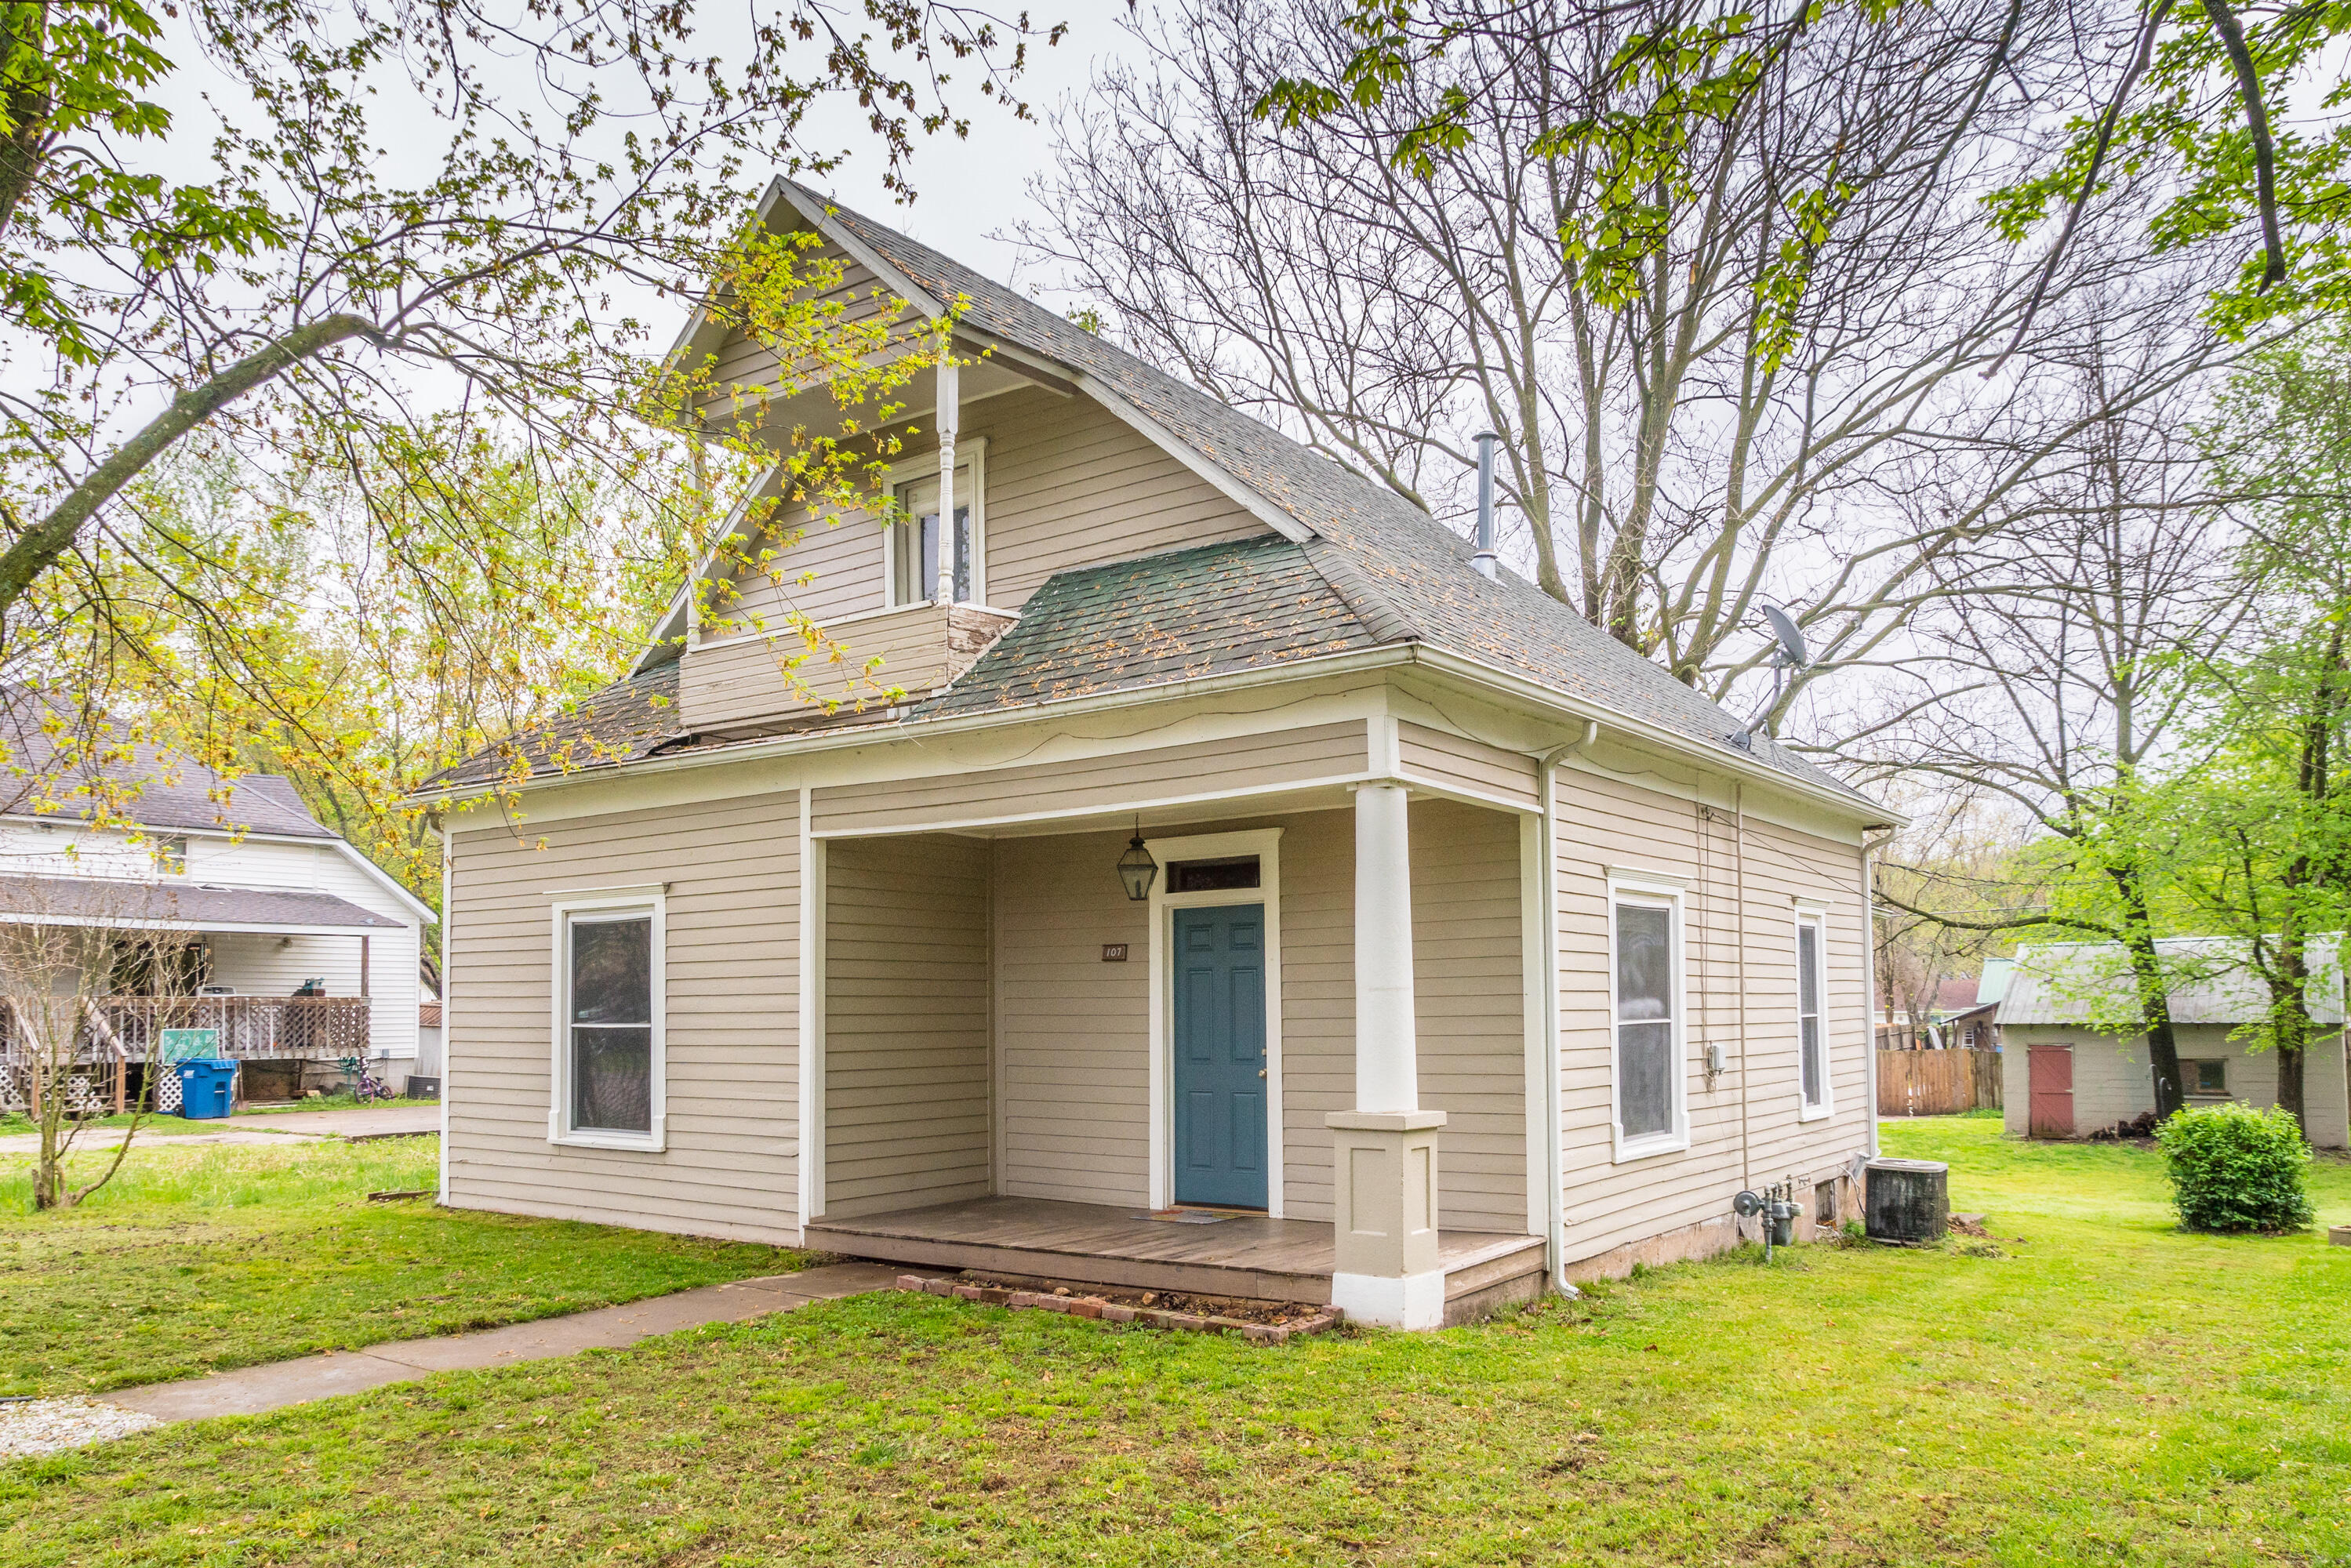 107 North Crane Street Crane, MO 65633